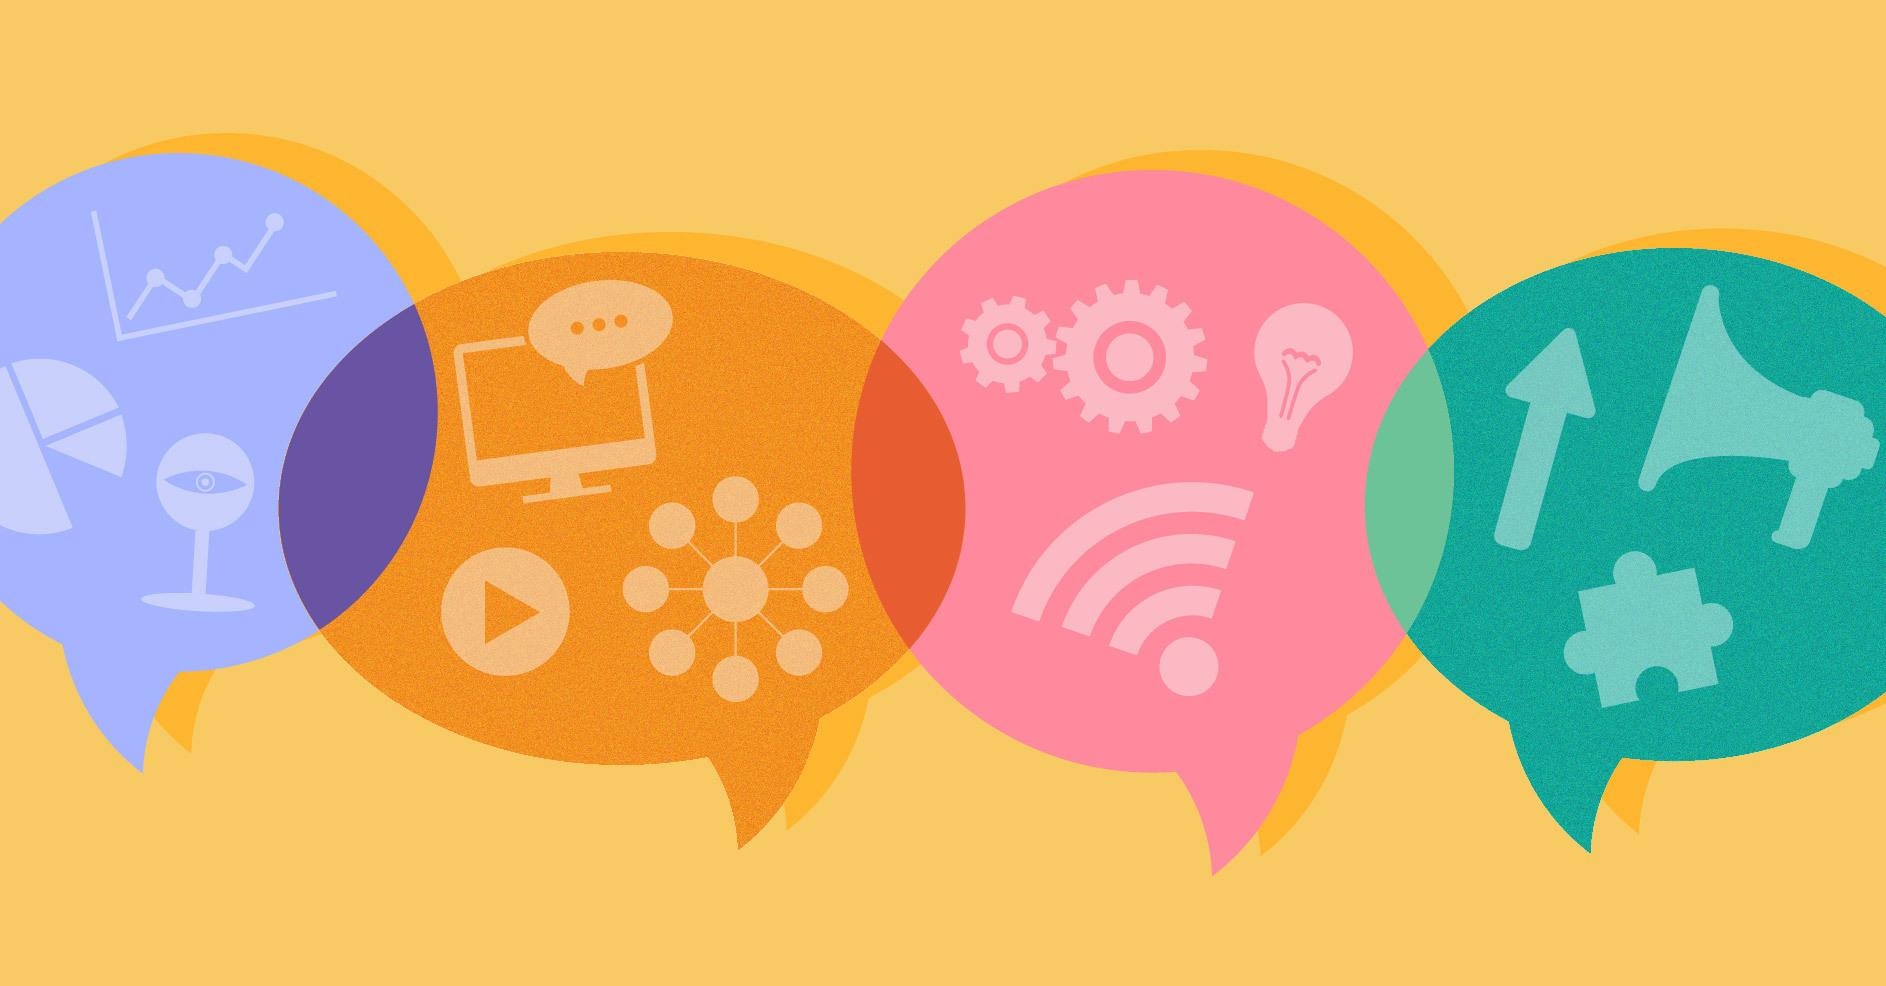 https://spotme.com/wp-content/uploads/2021/03/Hero-The-Best-B2B-Event-Marketing-Ideas-Going-Viral.jpg